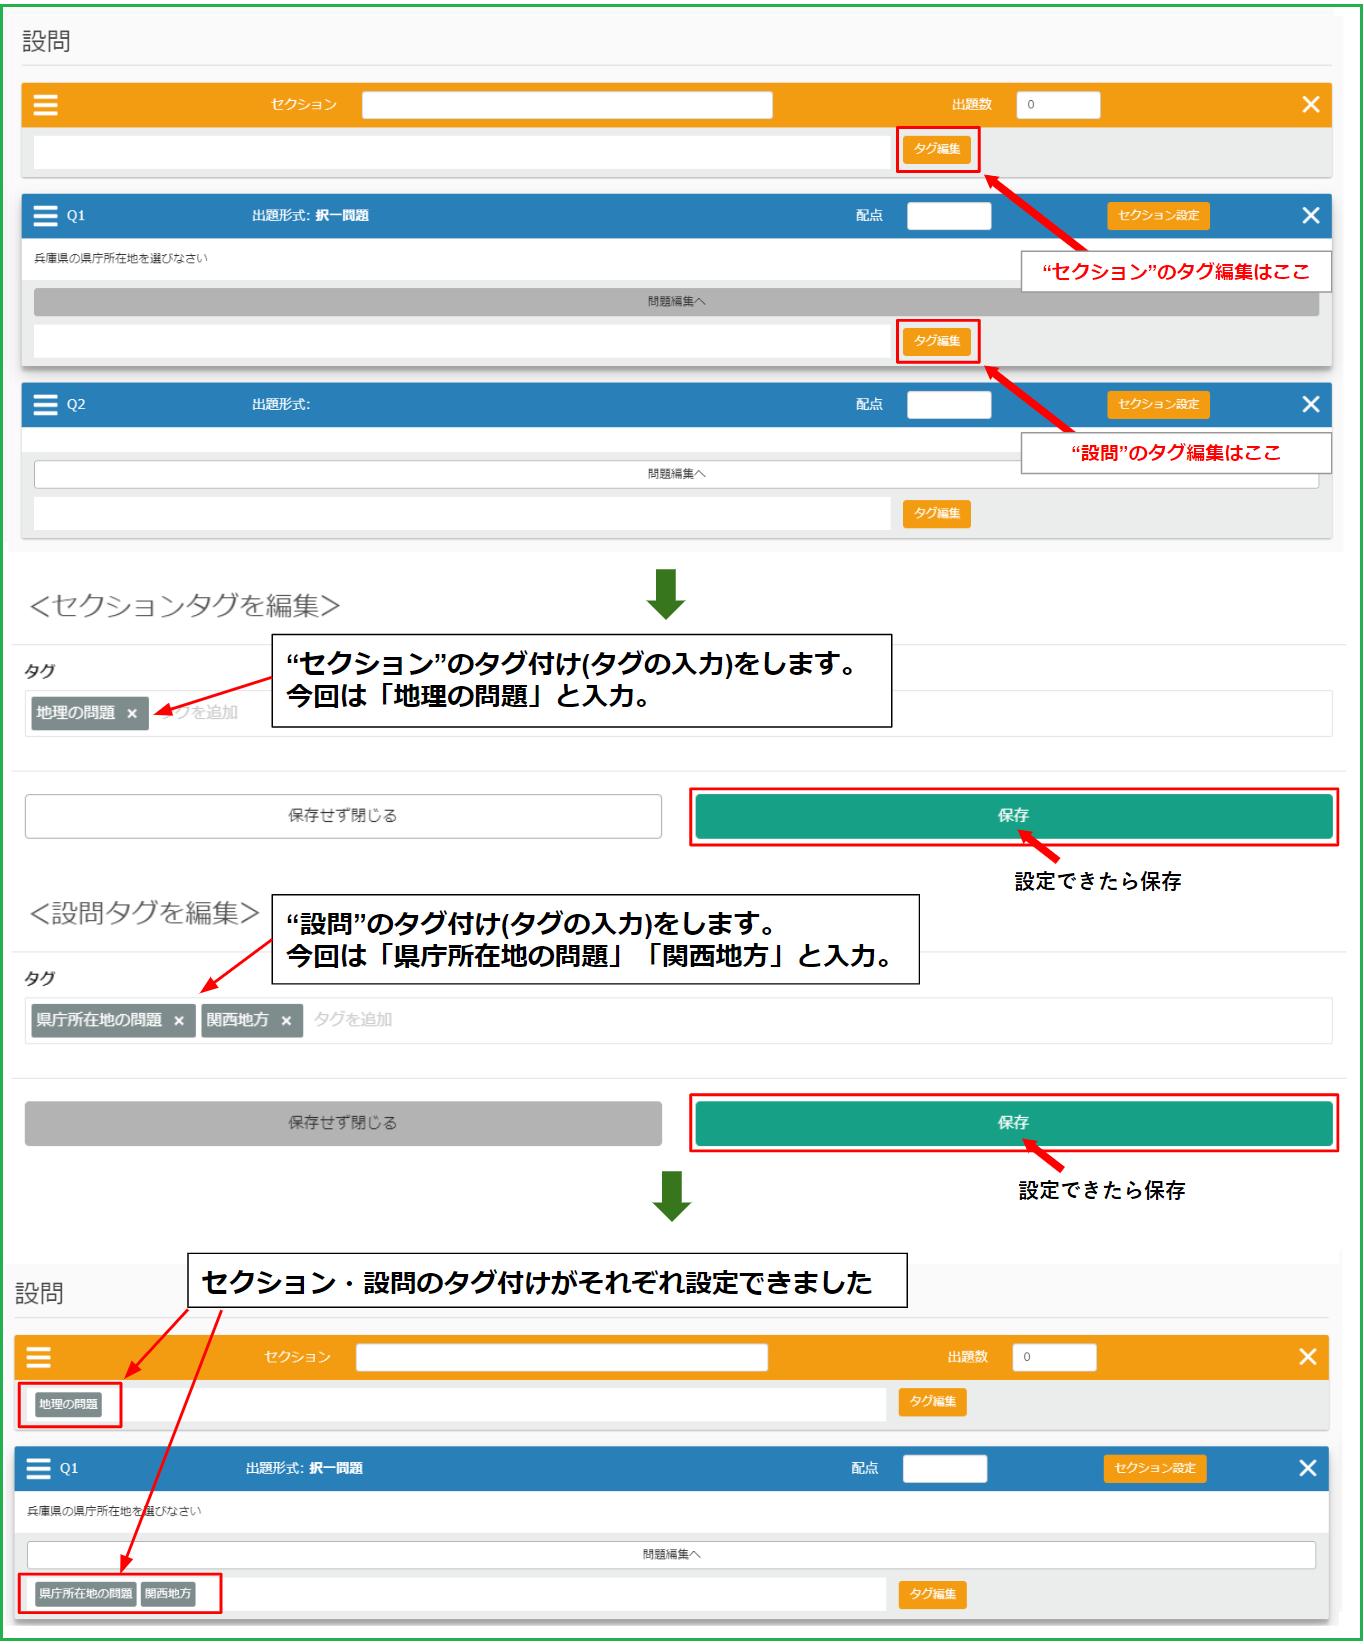 learningBOX問題作成フォーム